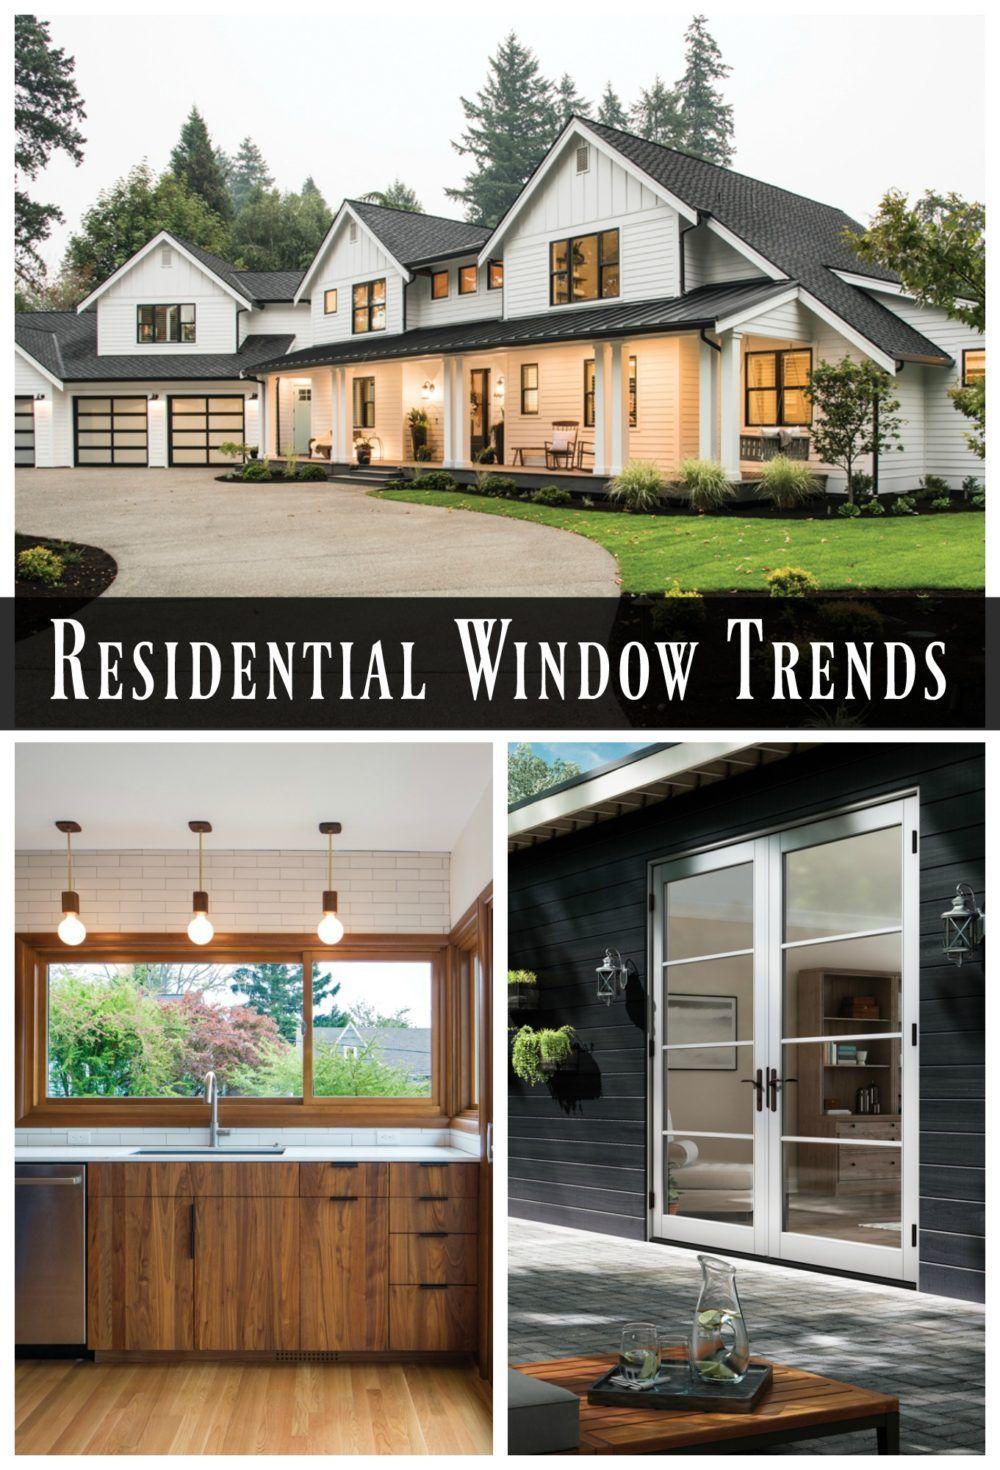 Residential Window Trends Residential windows, Modern